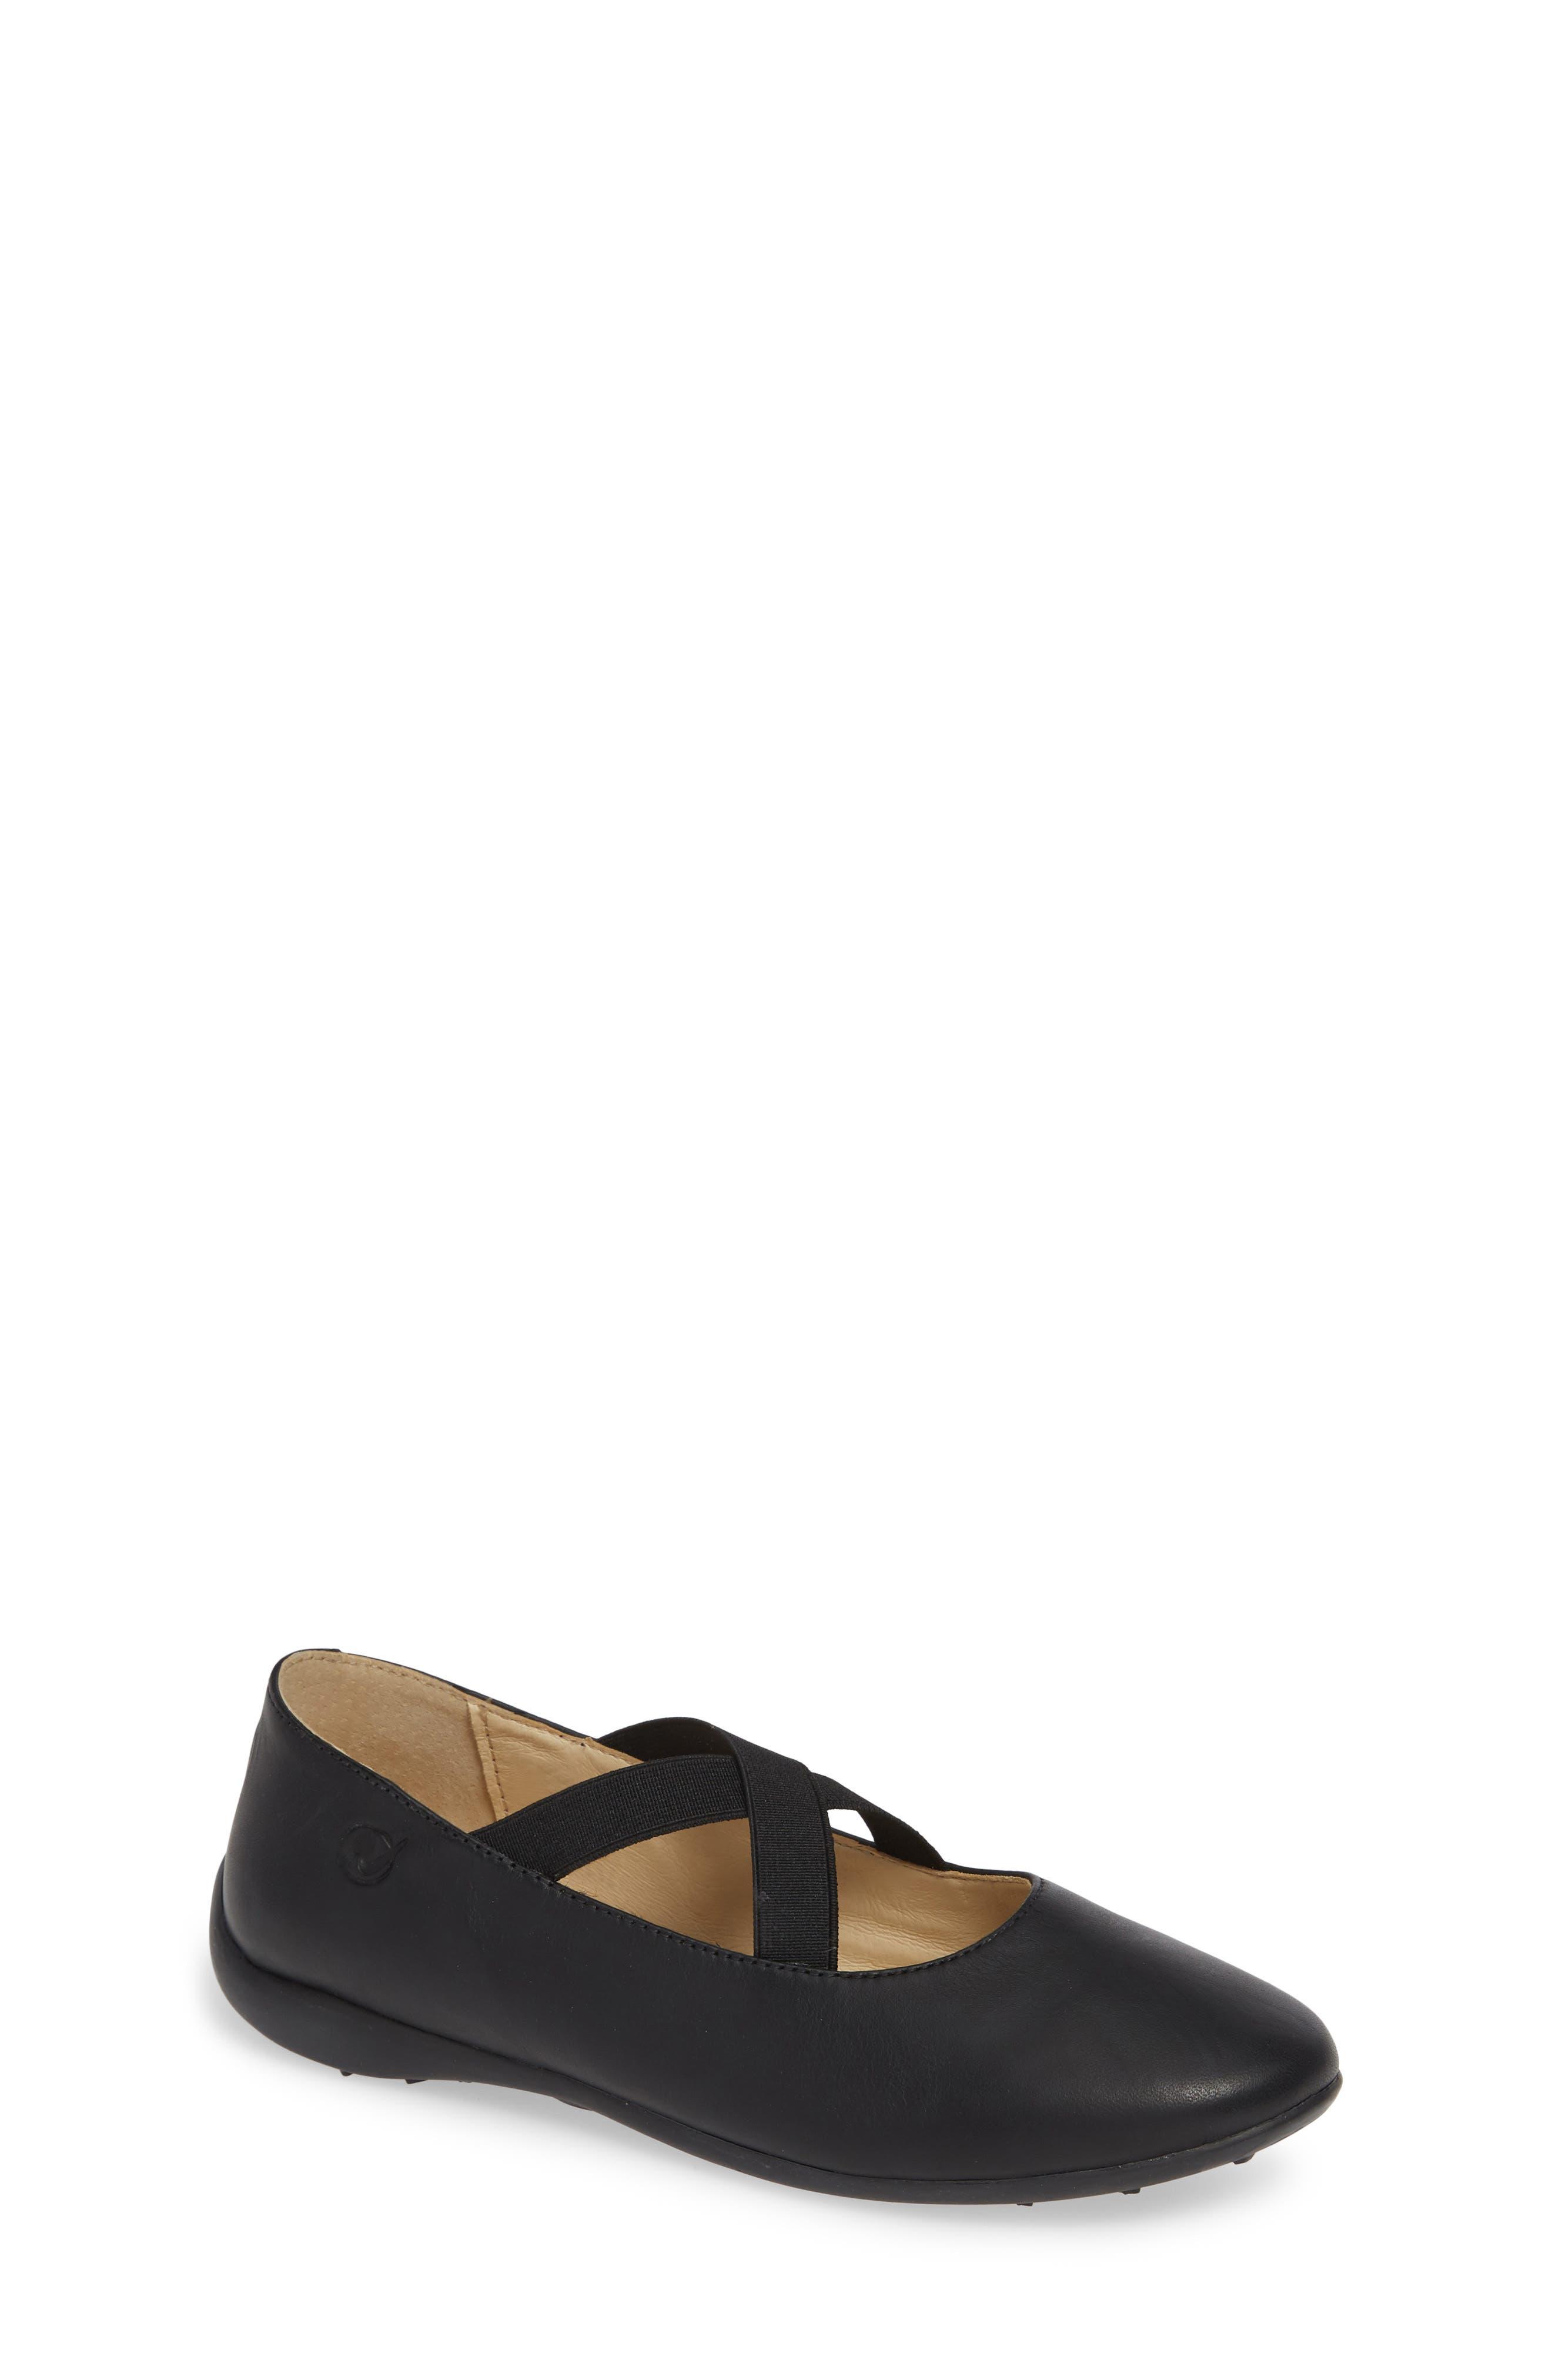 Matera Ballet Flat,                             Main thumbnail 1, color,                             Black Leather